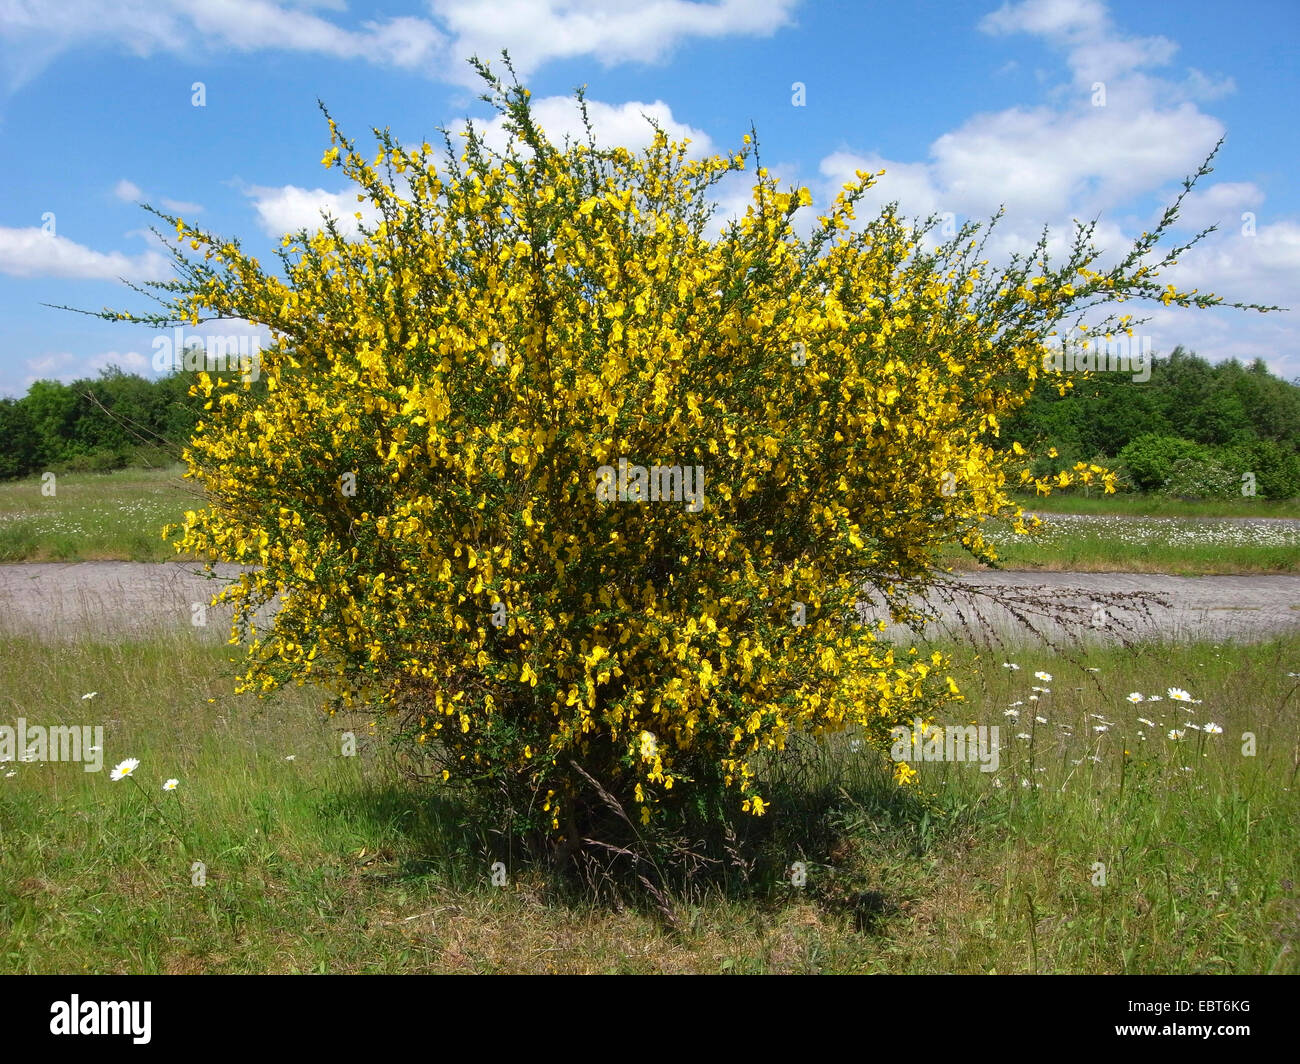 Common Flowering Bushes